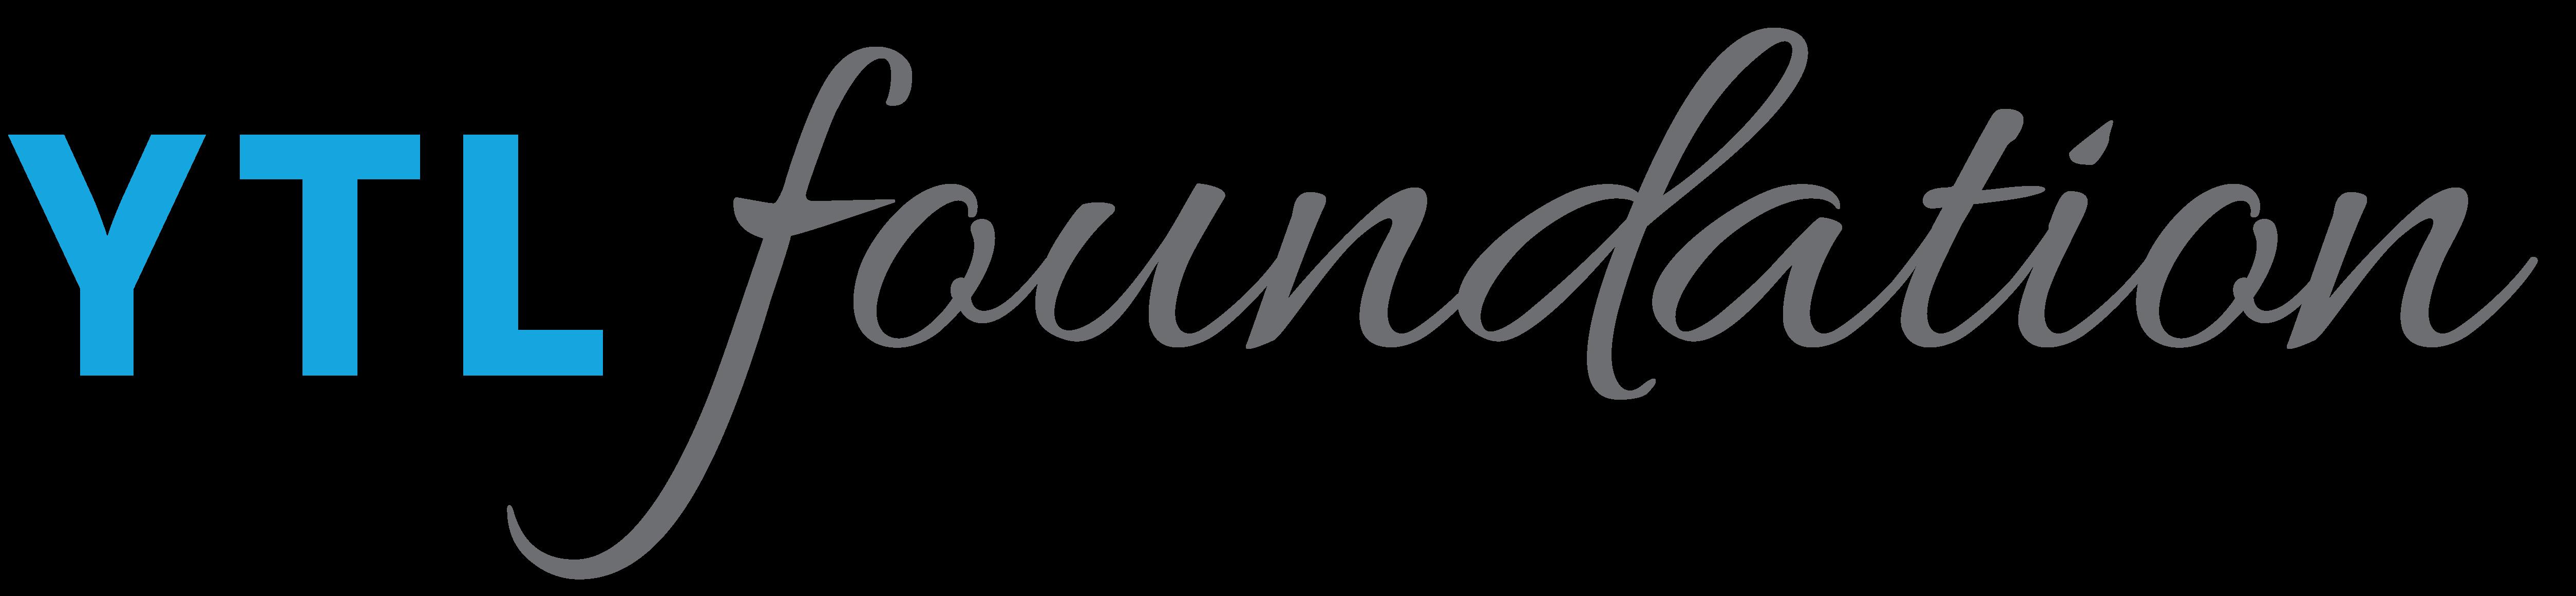 YTL Foundation Logo